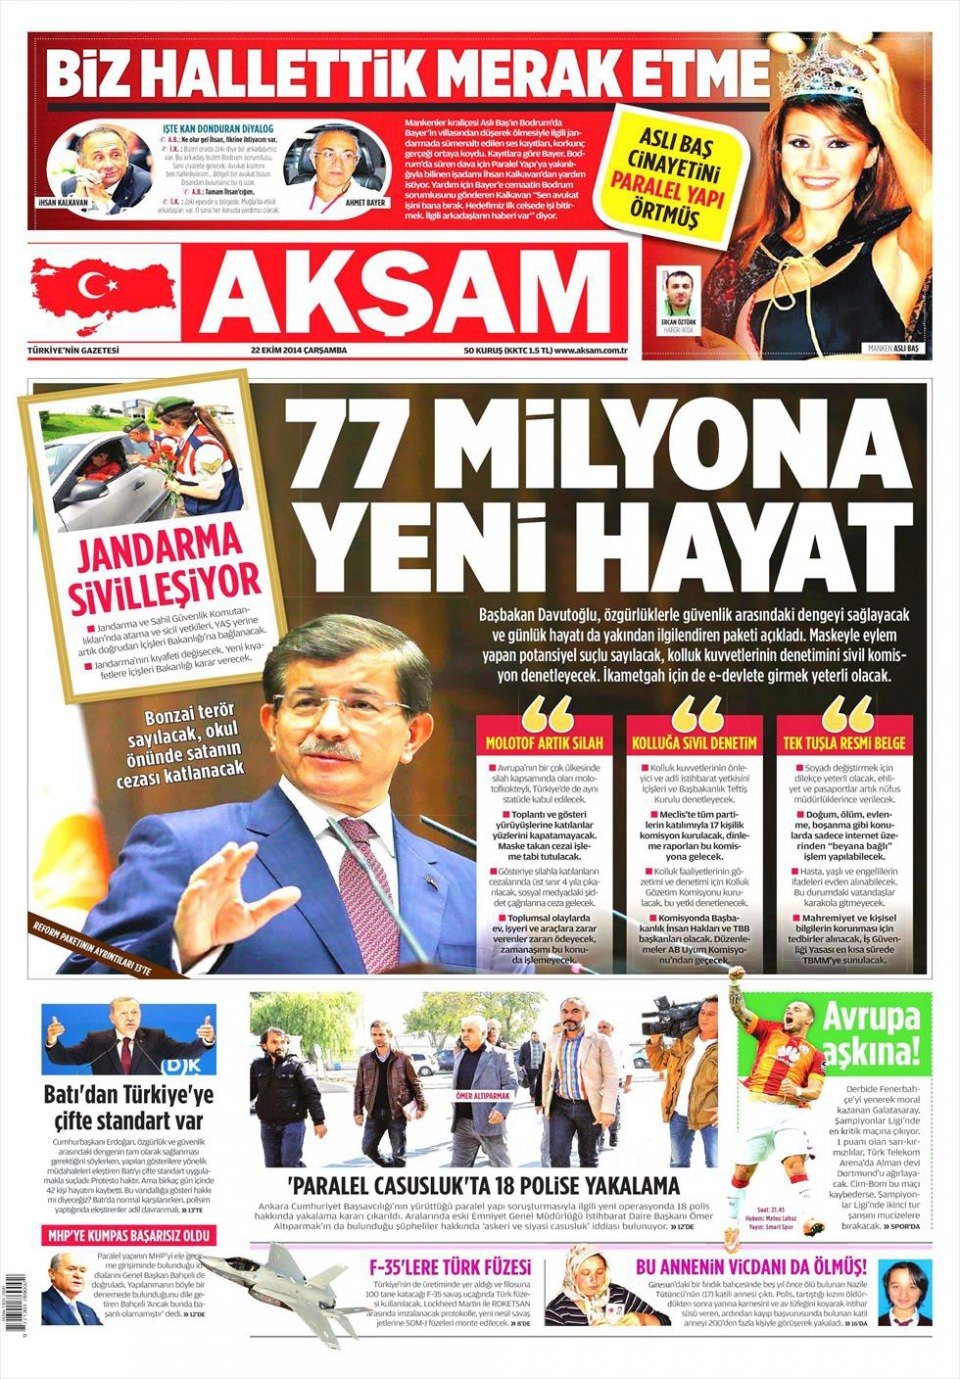 22 Ekim 2014 gazete manşetleri 1